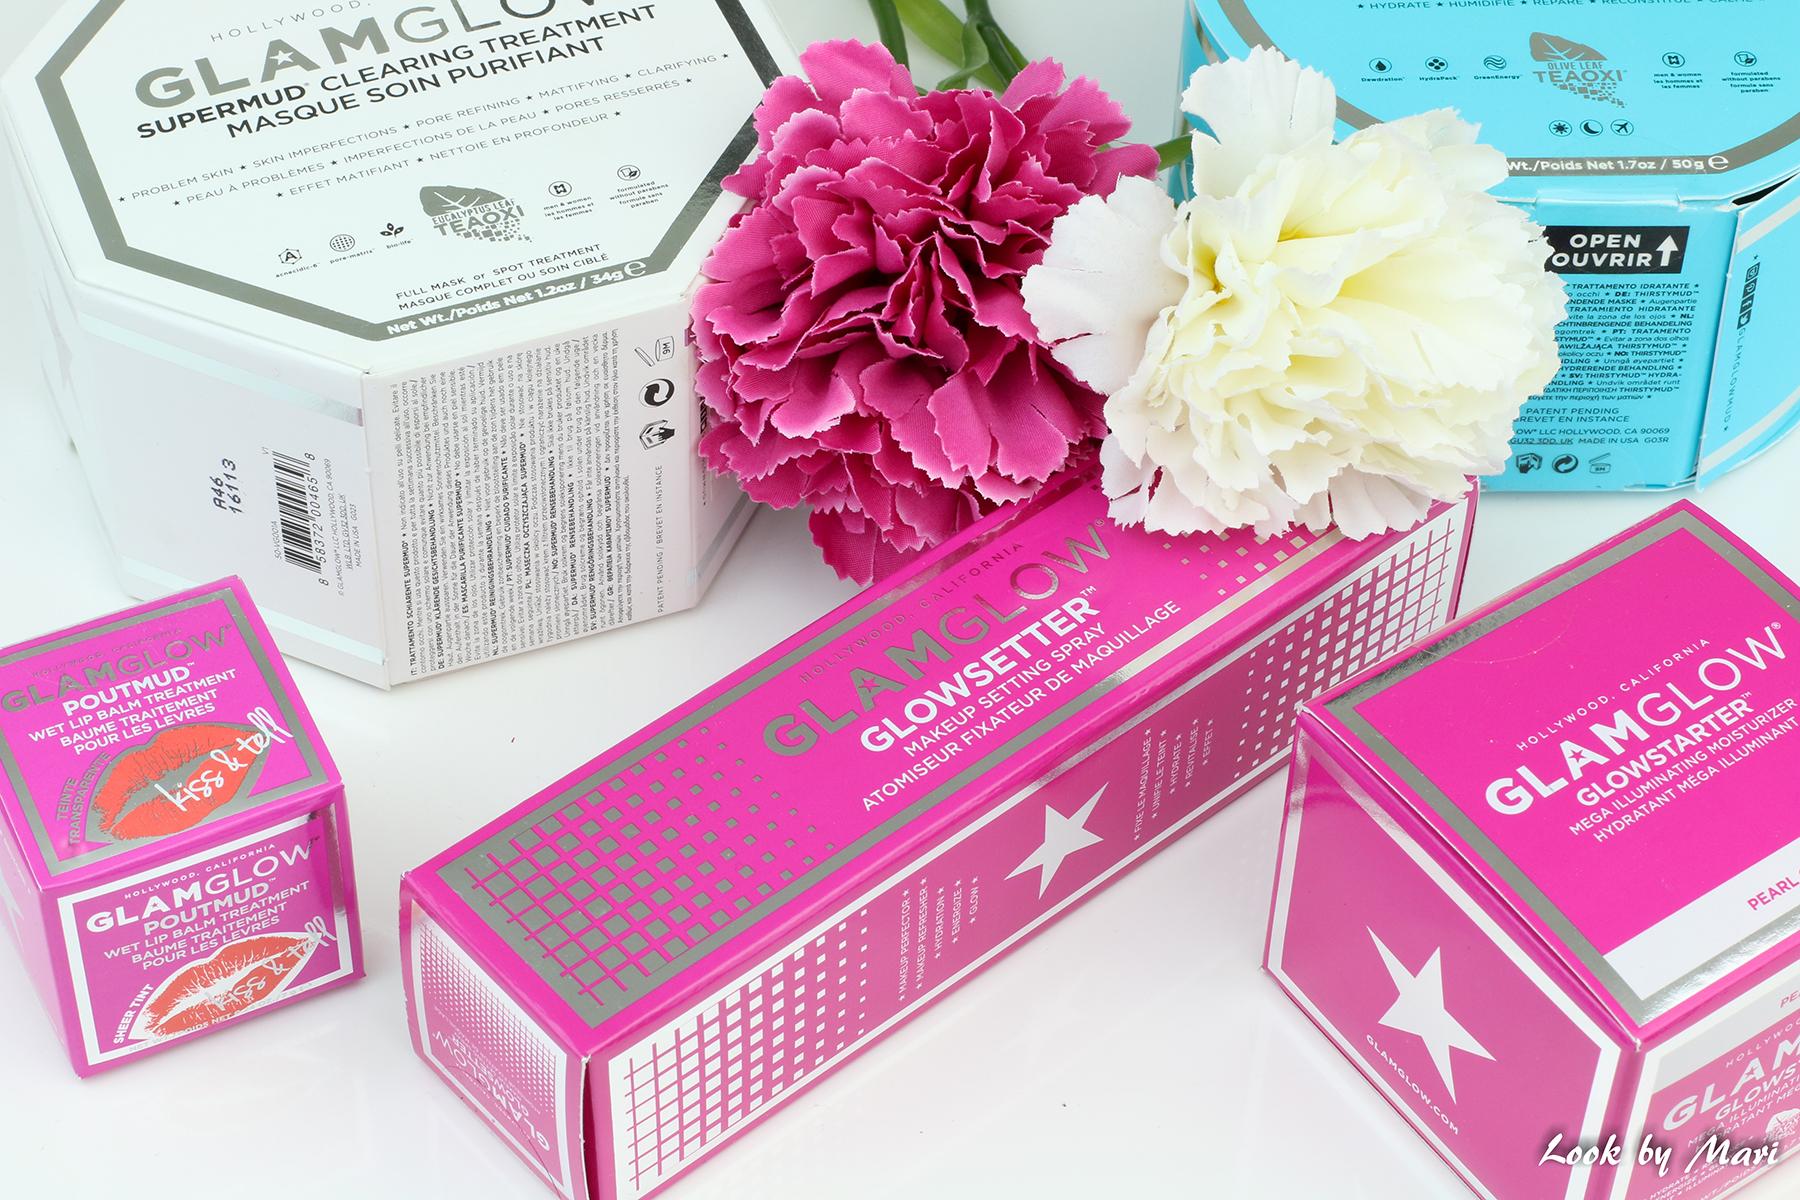 34 glamglow poutmud glowsetter glowstarter pearl glow review kokemuksia blog blogi